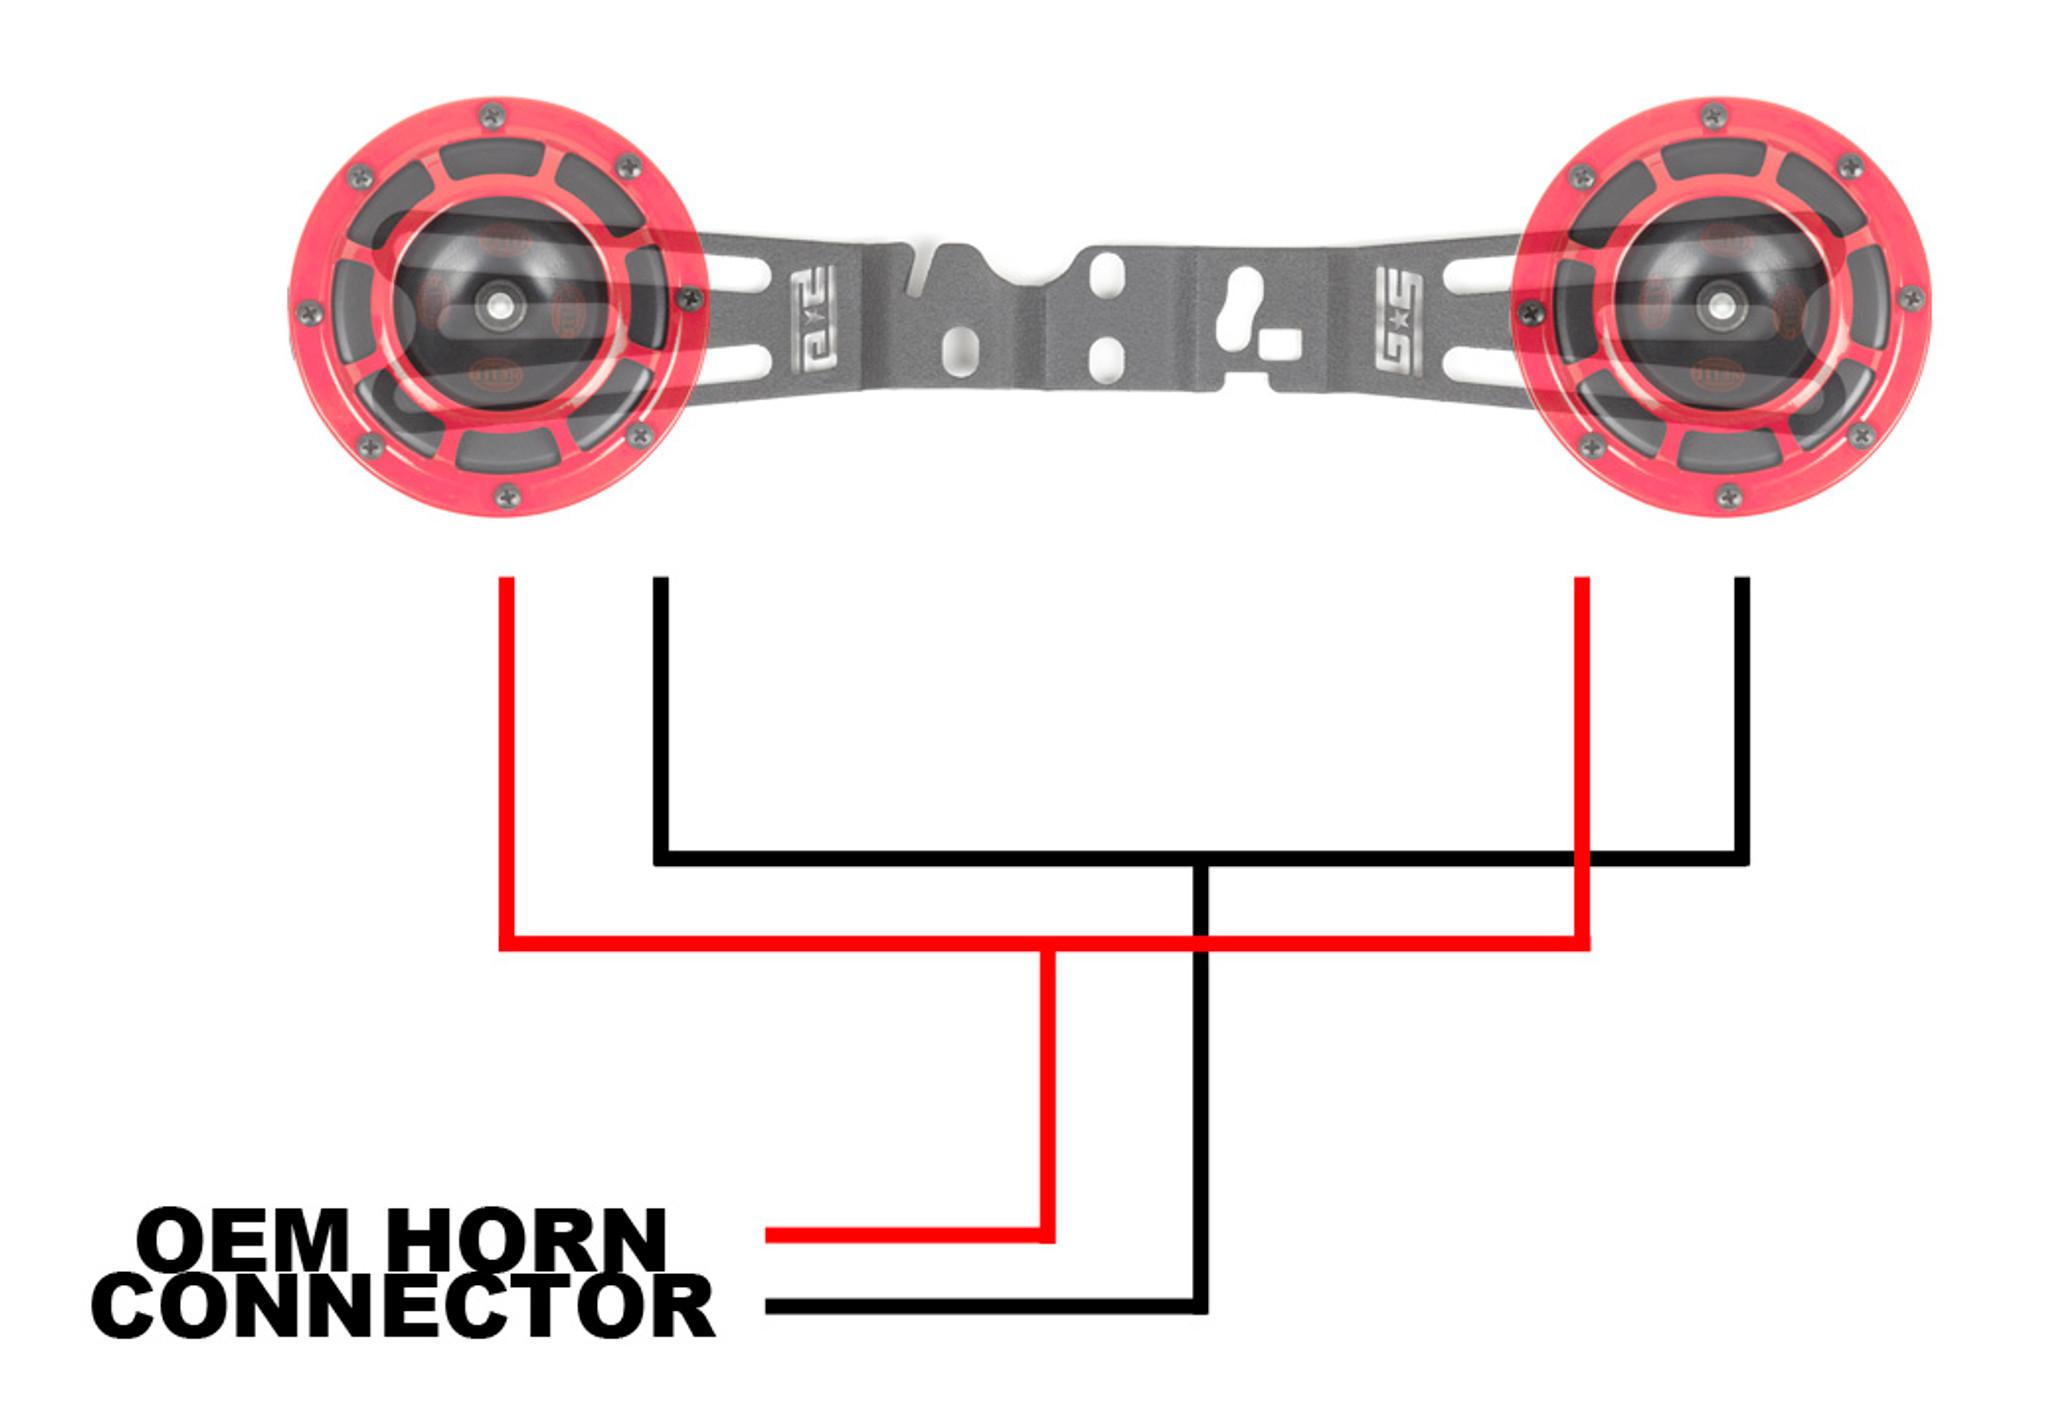 a Wiring Diagram - Migfa.rep-mannheim.de • on a body diagram, a fuse diagram, a roofing diagram, a relay diagram, a radiator diagram, a transmission diagram, a motor diagram, a regulator diagram,